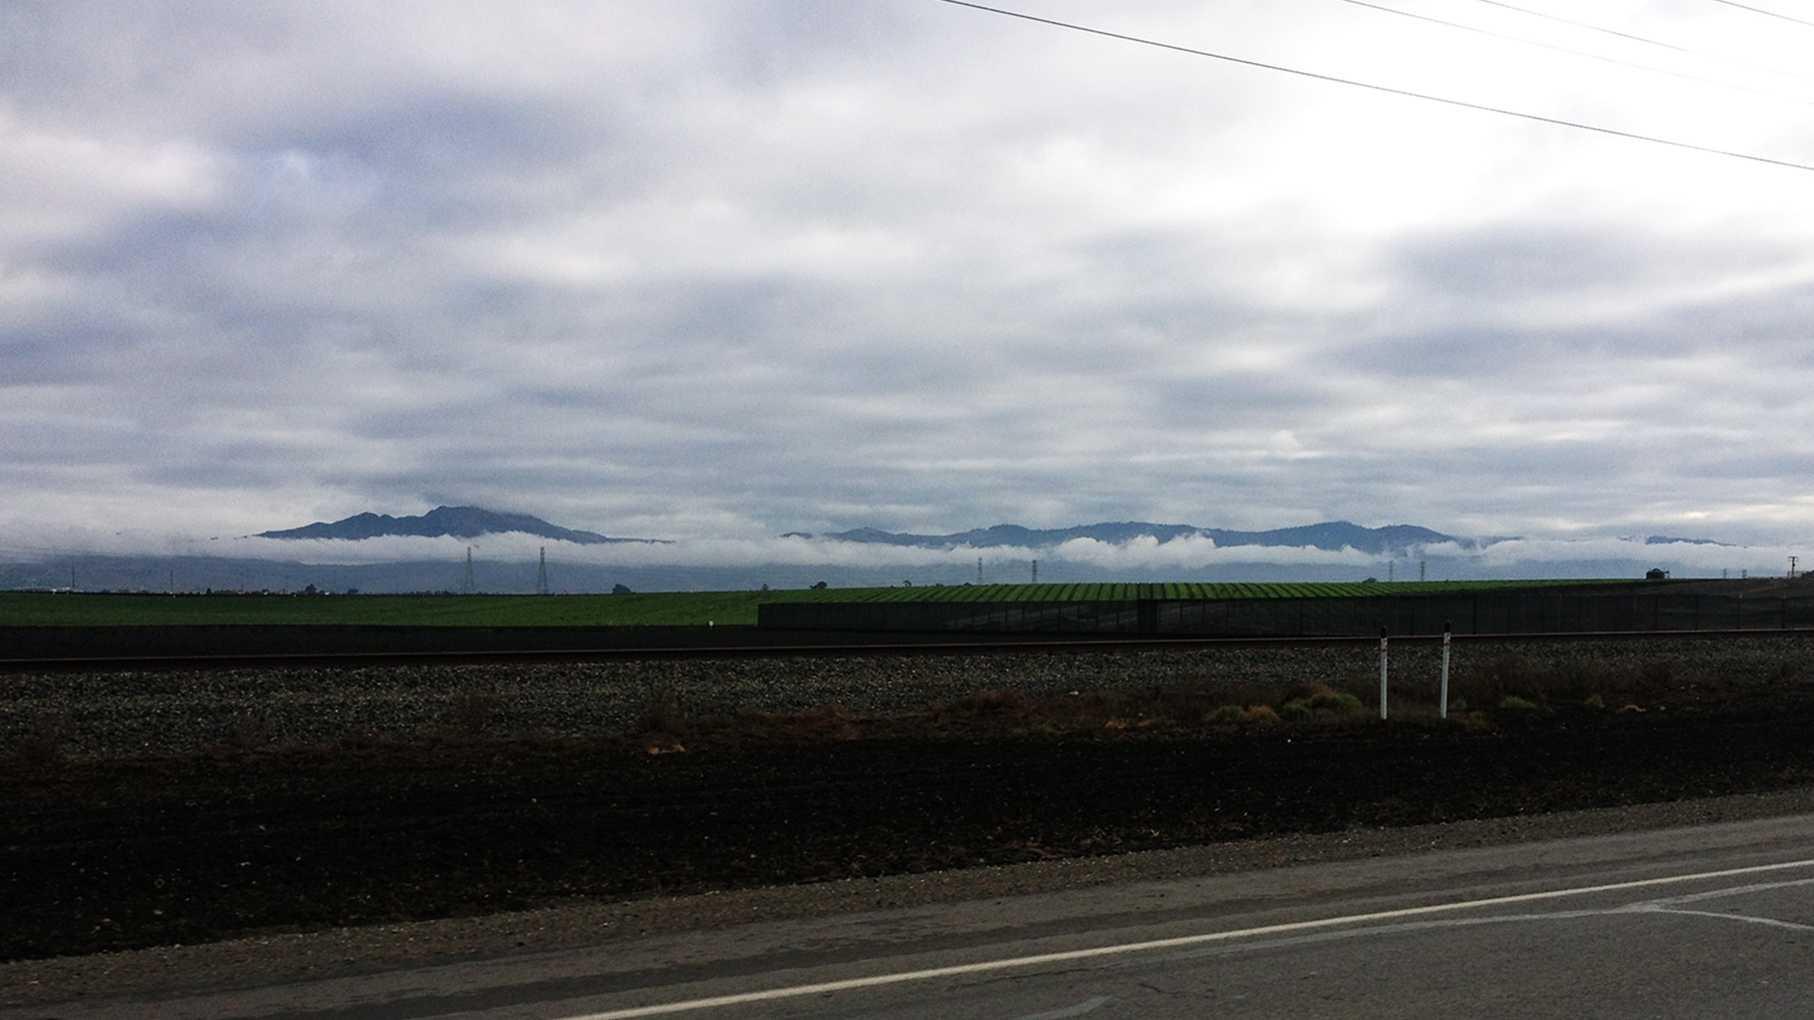 Rain clouds move past the Salinas Valley. (Nov. 21, 2013)